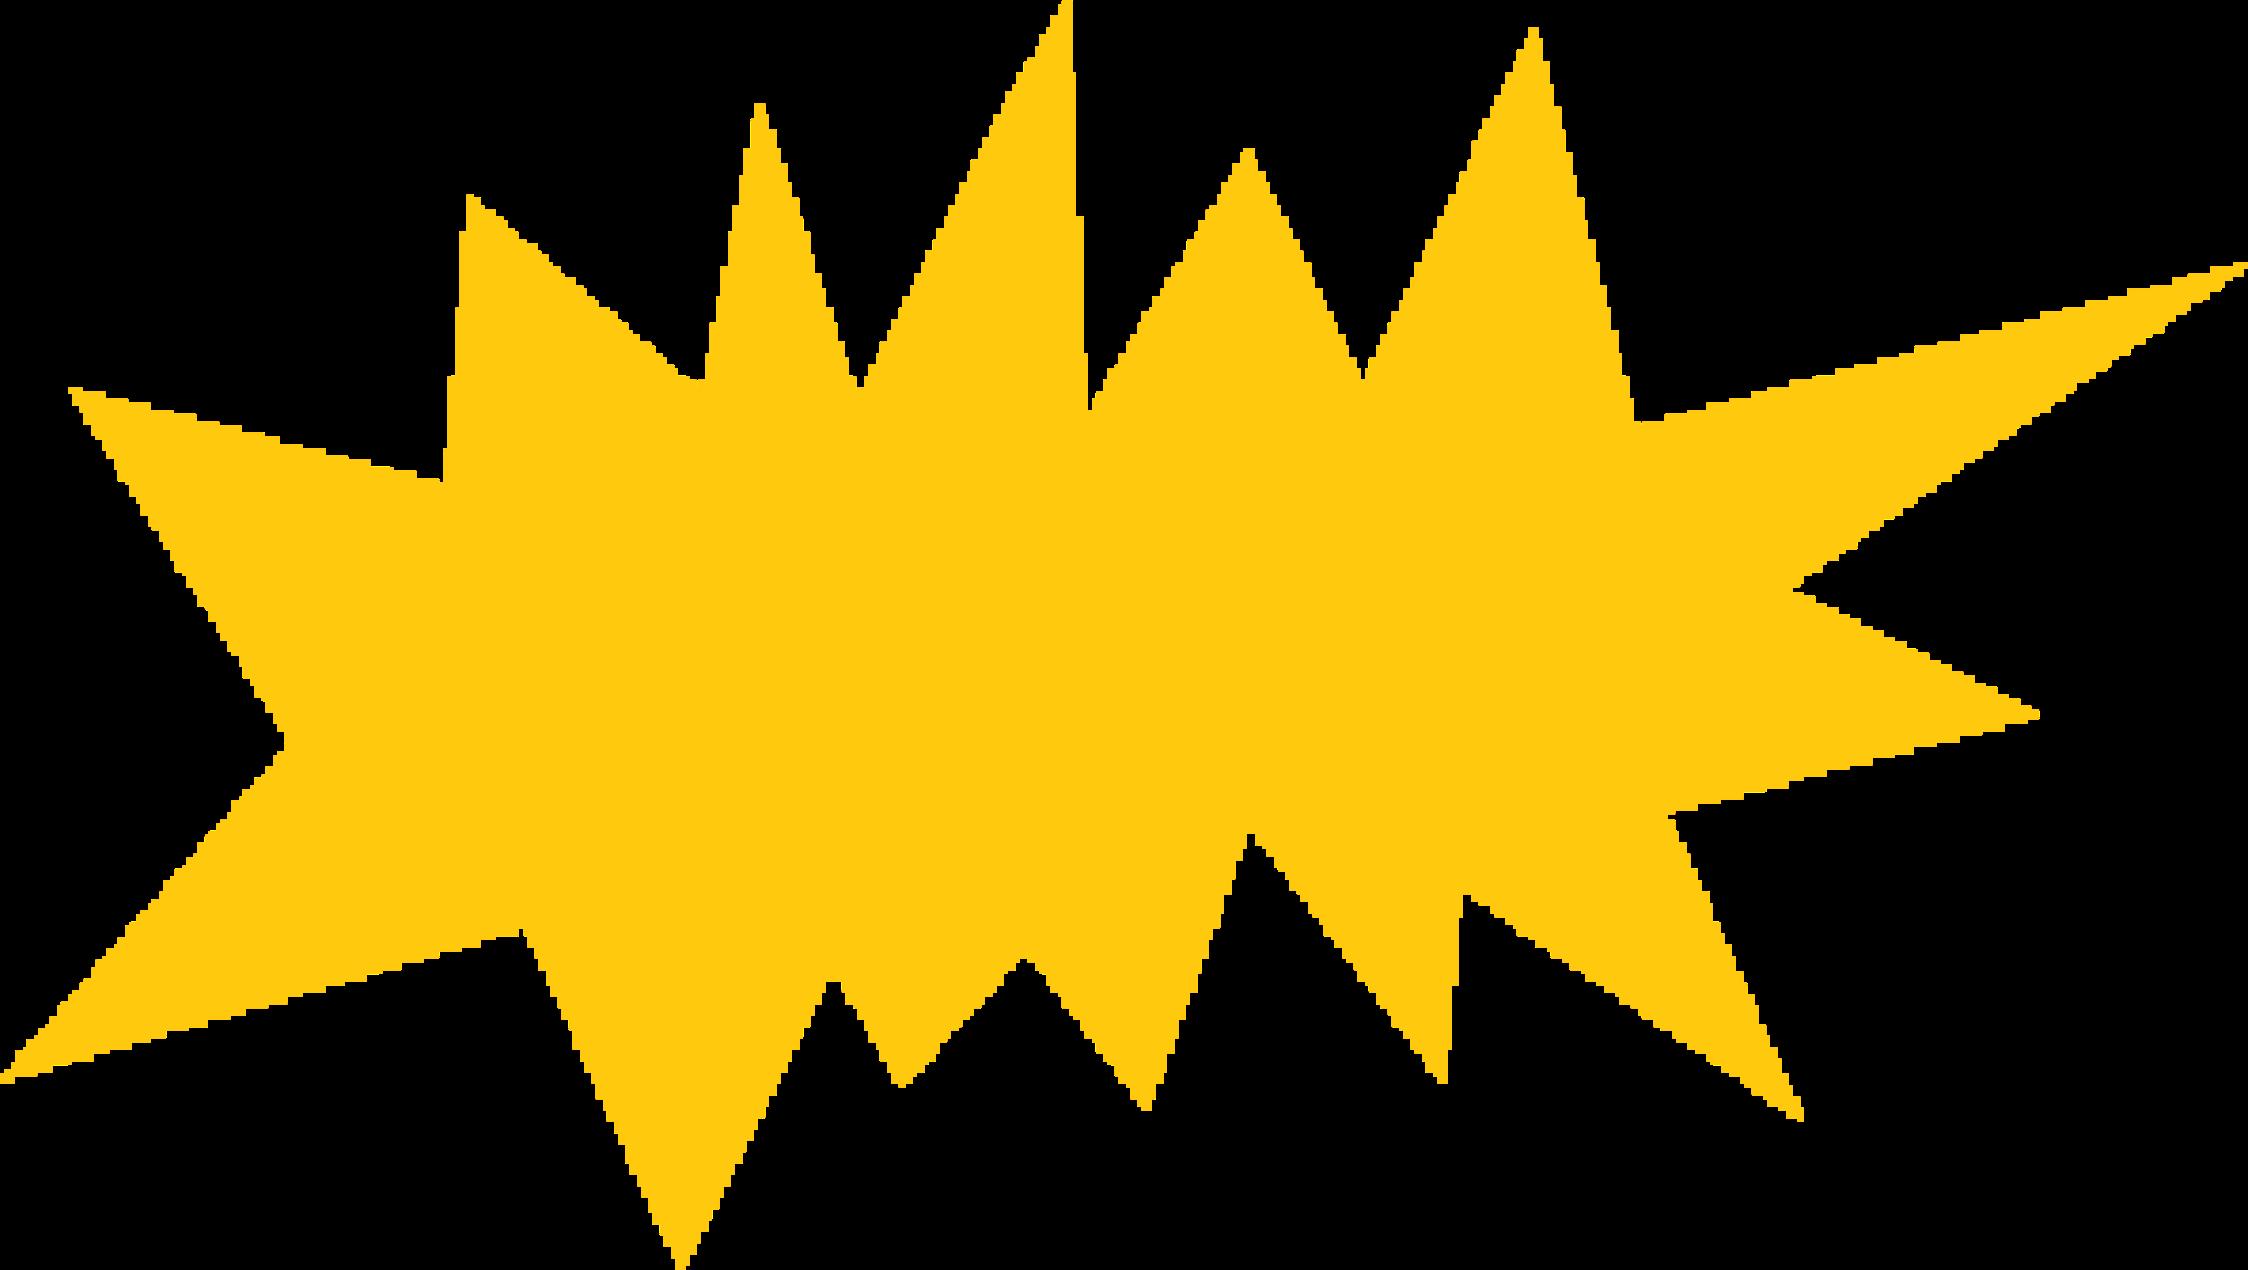 Big image png. Burst clipart yellow